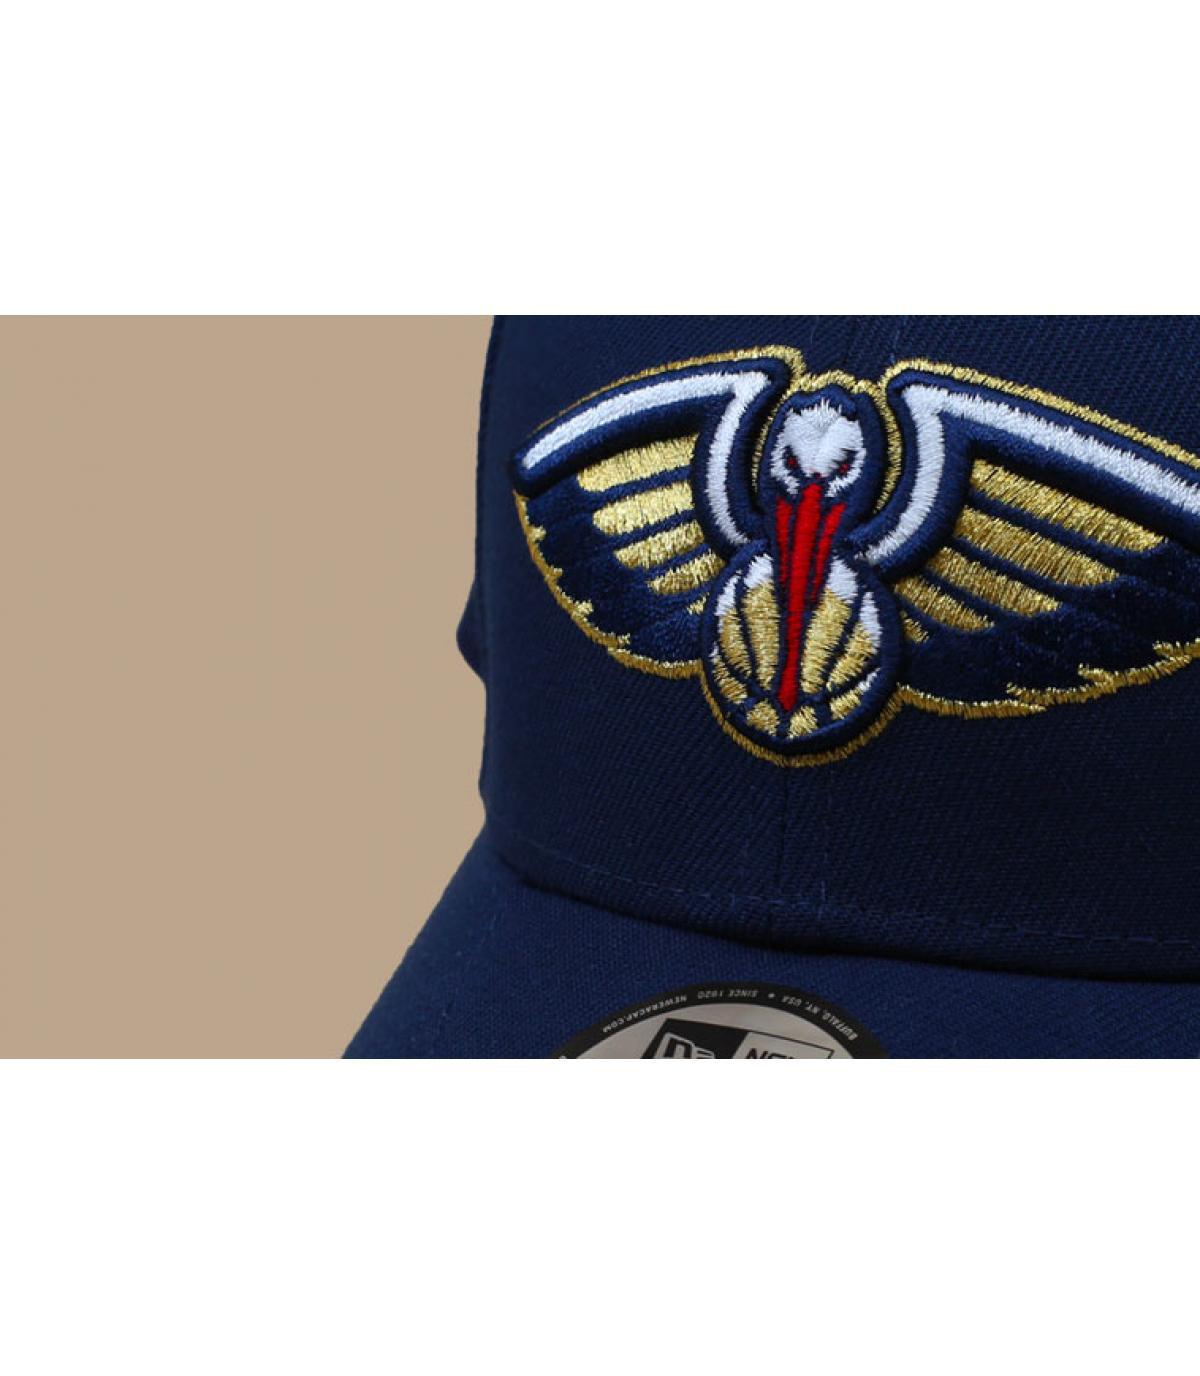 Detalles Pelicans NBA The League imagen 3